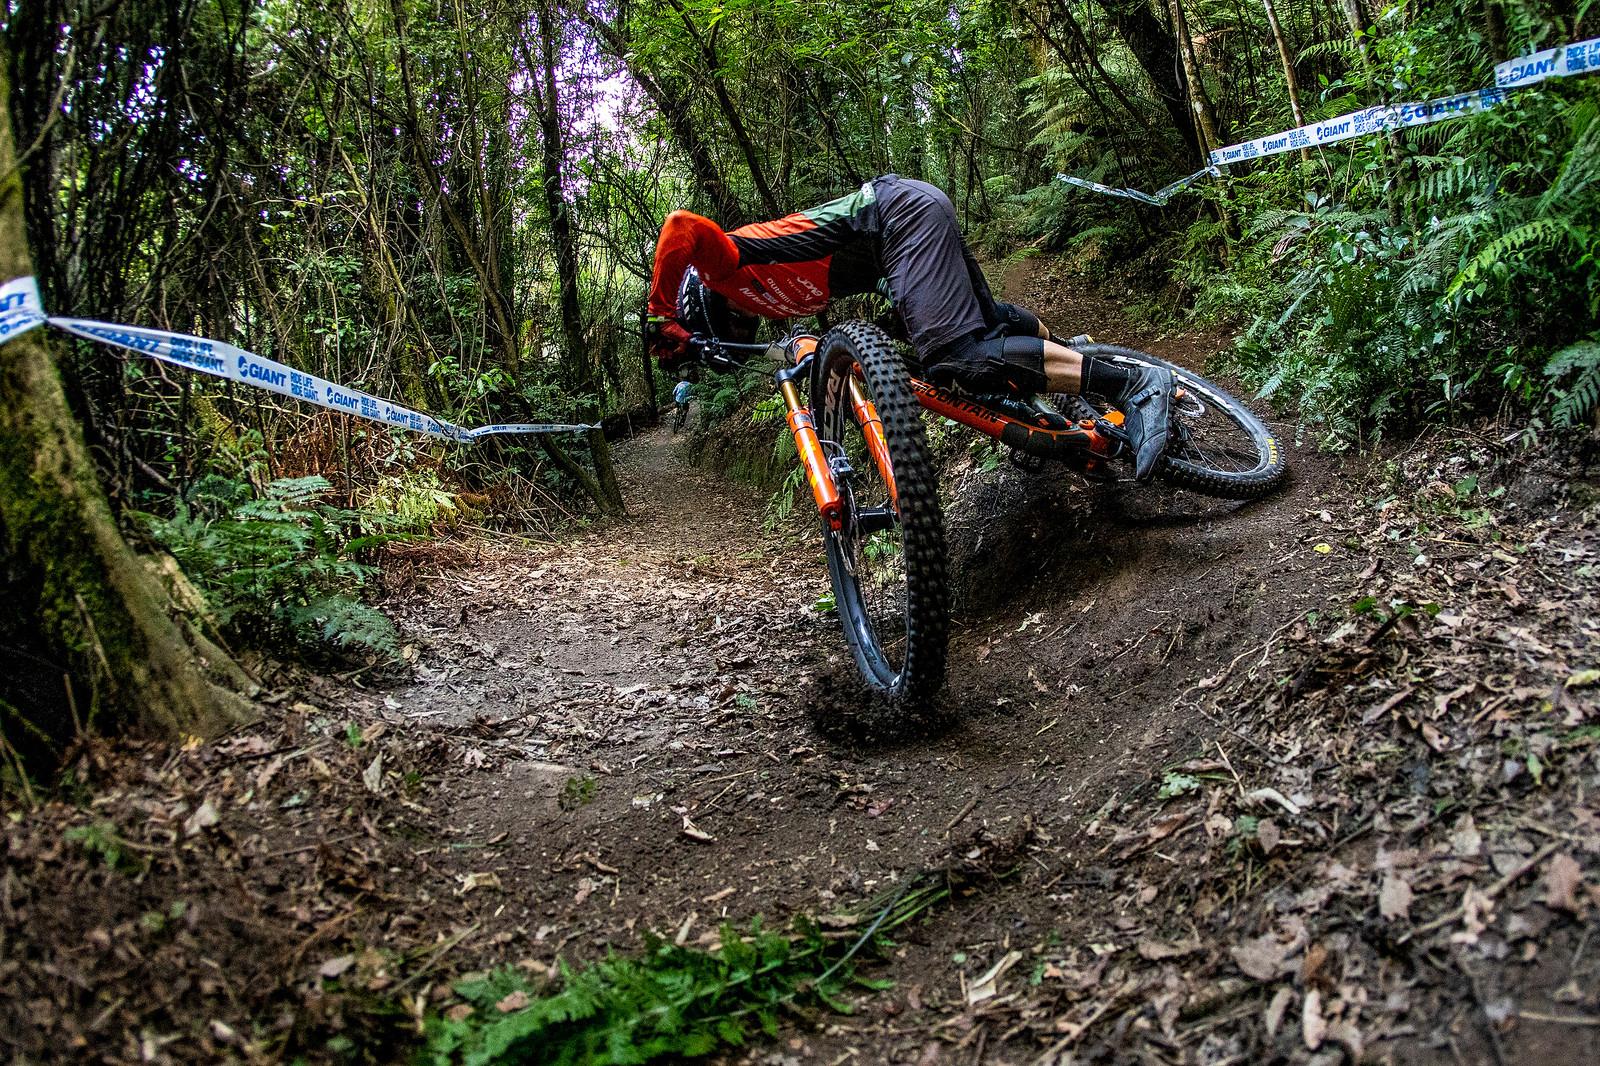 Jesse Melamed - 2019 Enduro World Series Crankworx Rotorua - Mountain Biking Pictures - Vital MTB